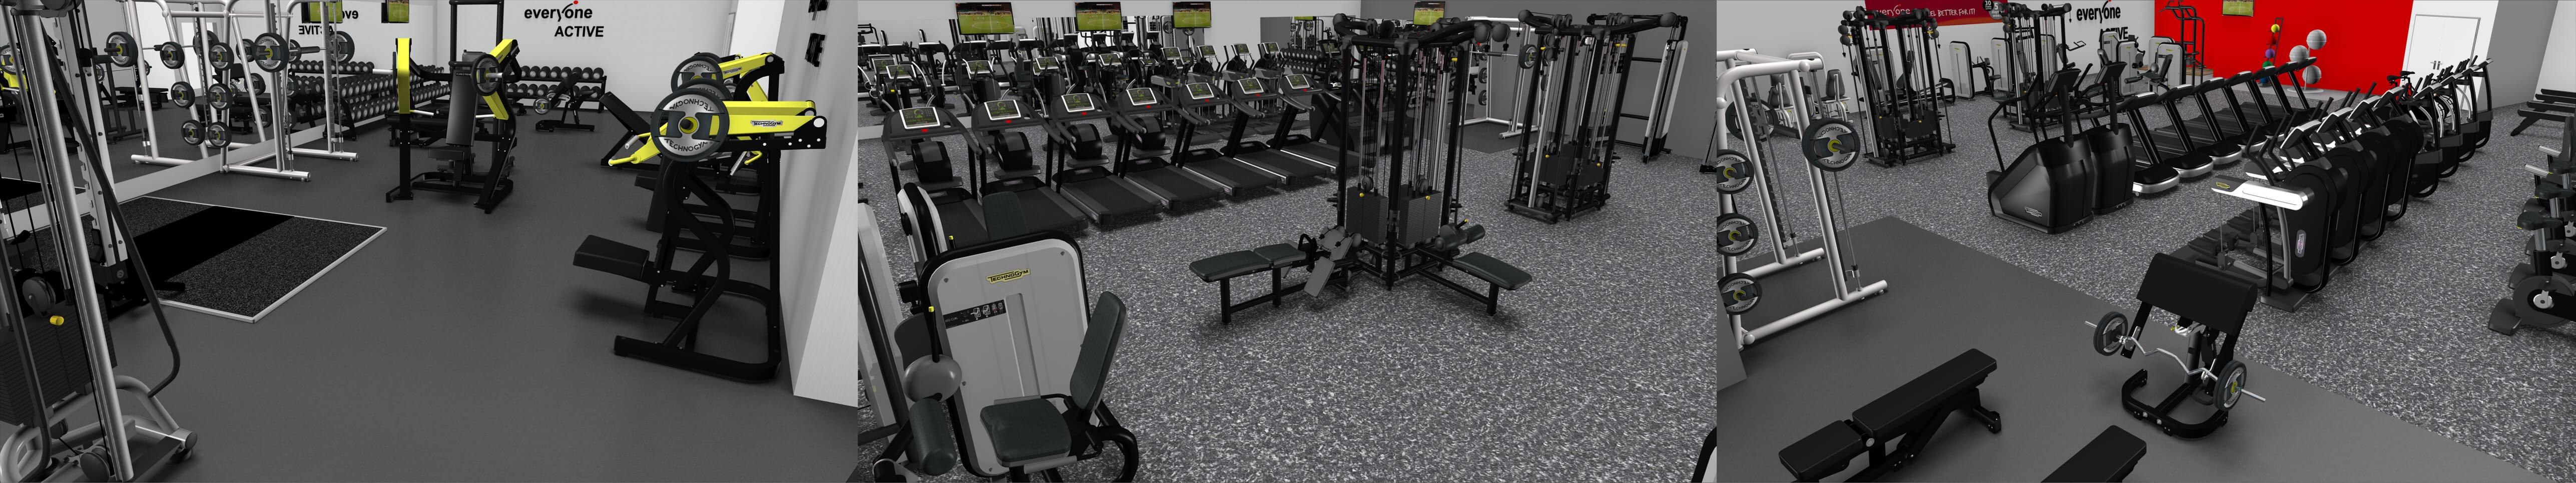 Dormers-Wells-Gym